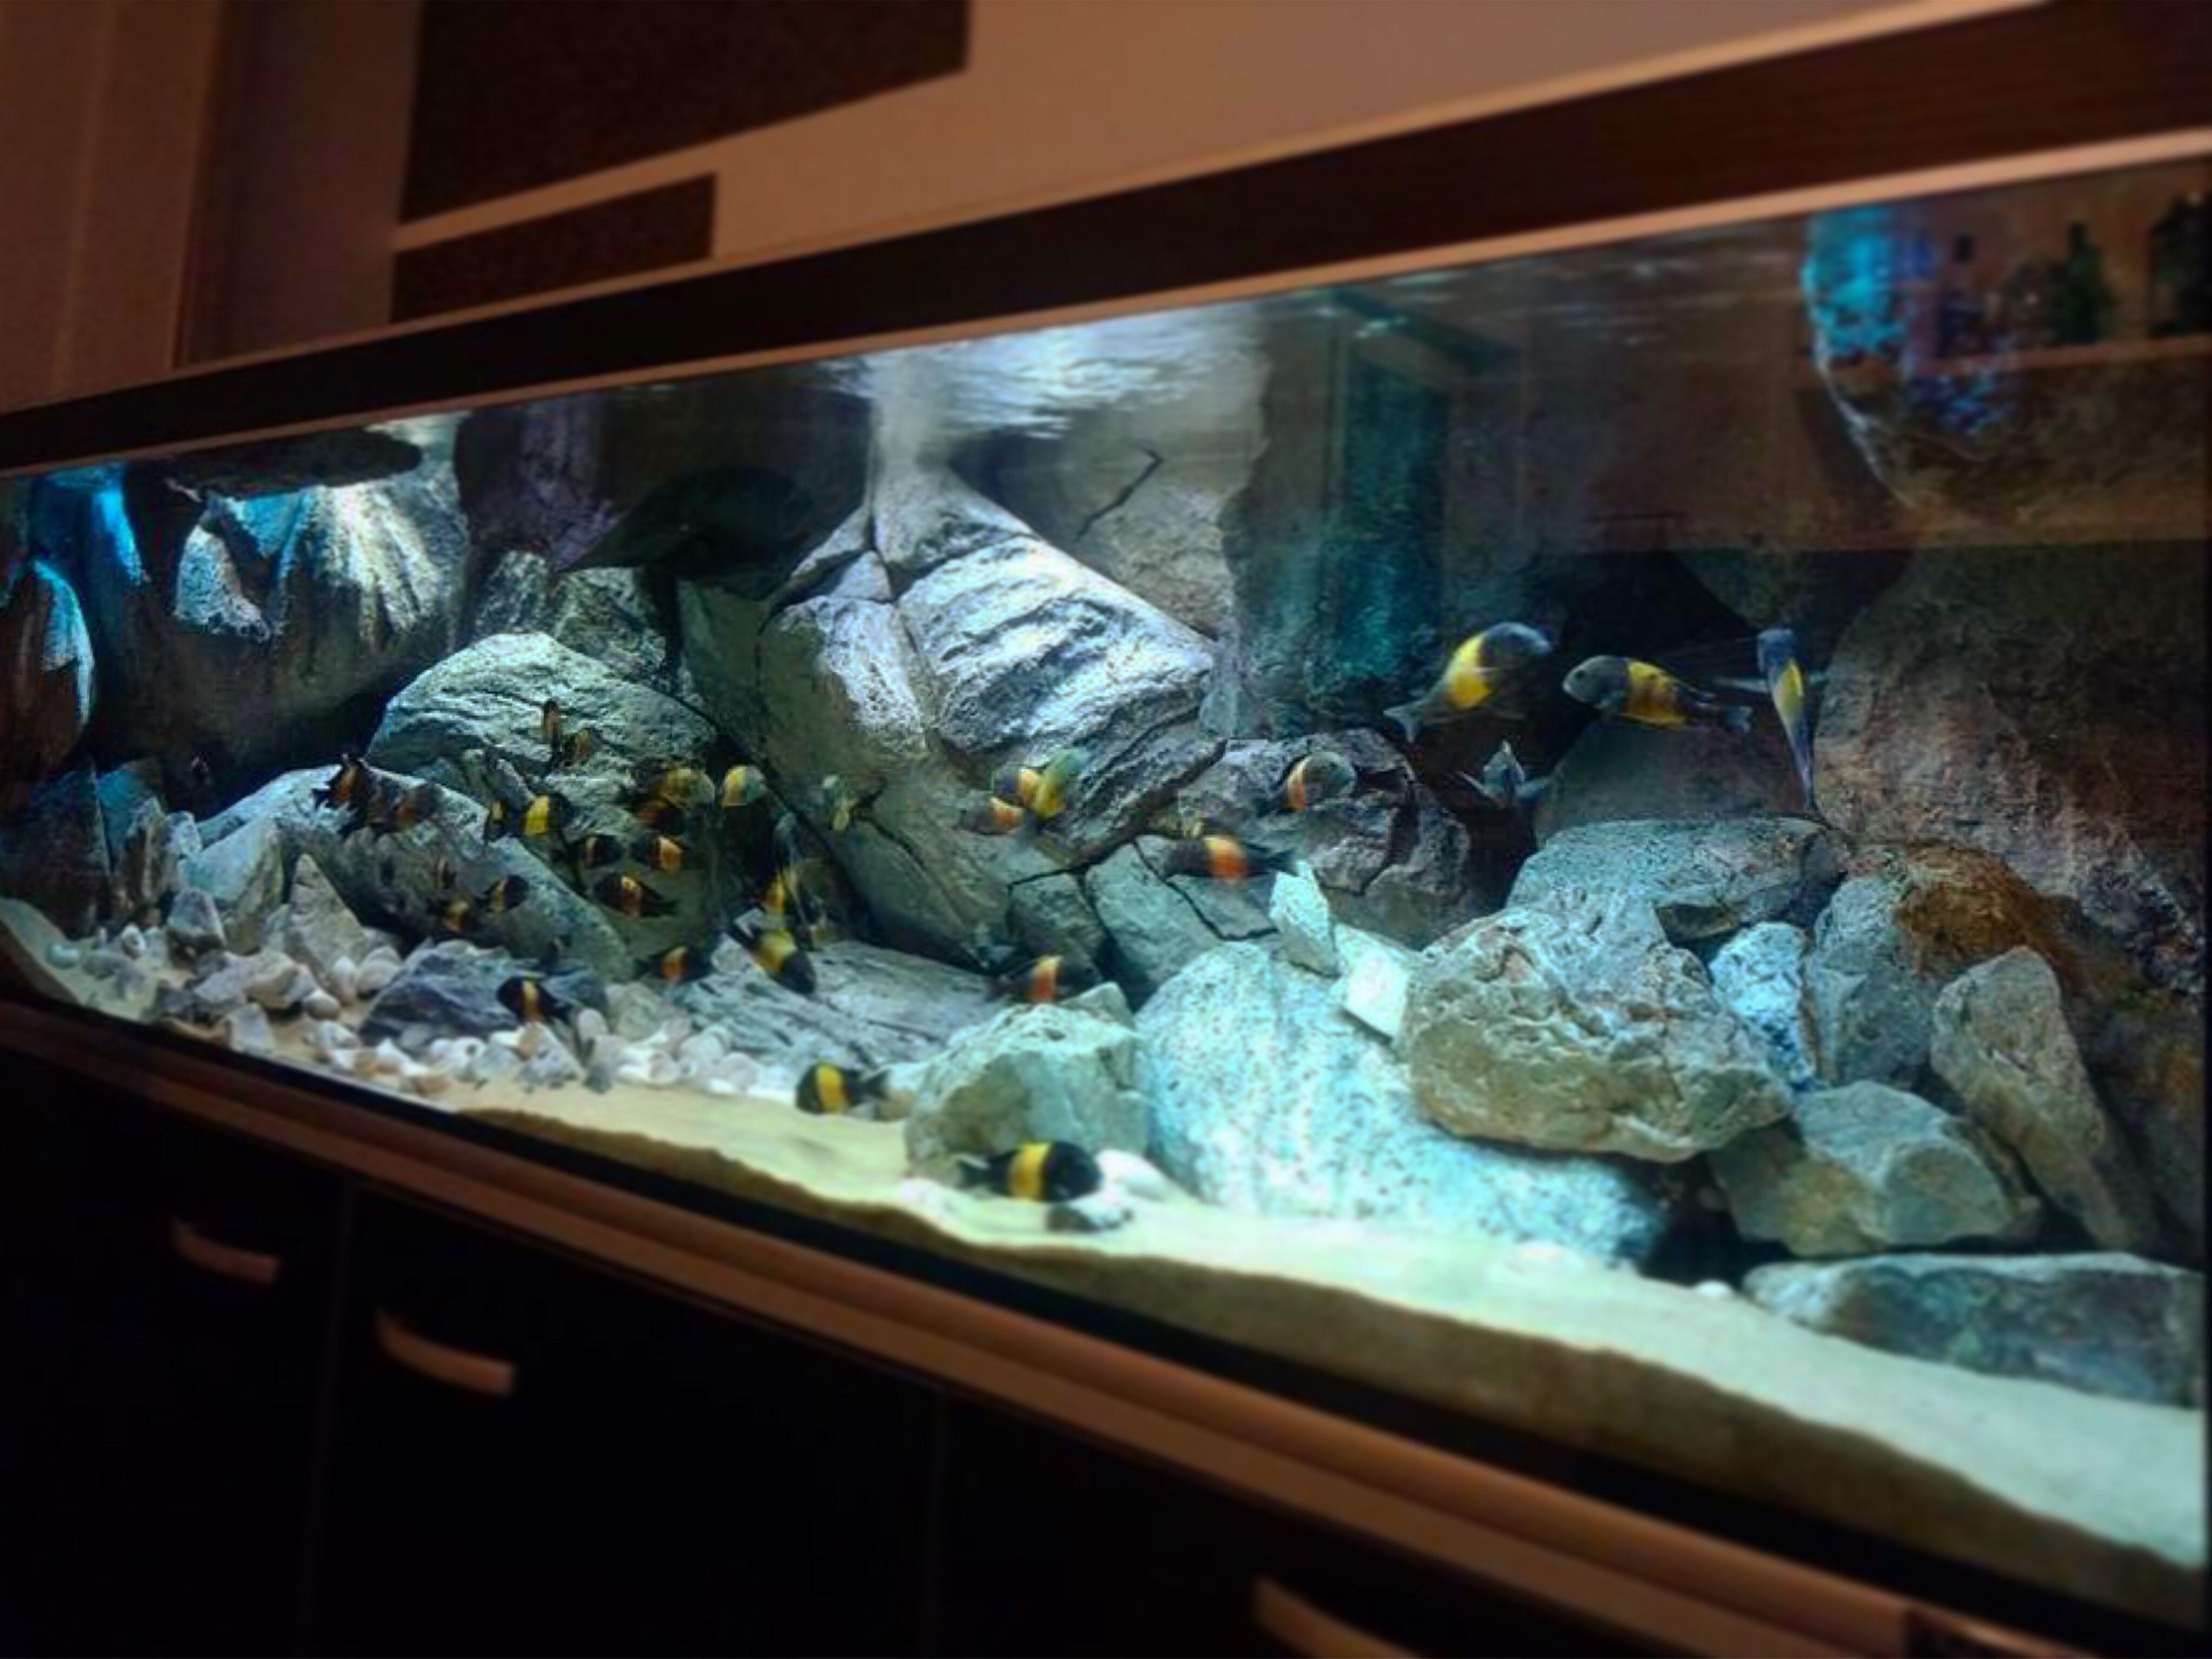 Pin By Beelink Jad Aan On 3d Background African Cichlid Aquarium Aquarium Cichlid Aquarium